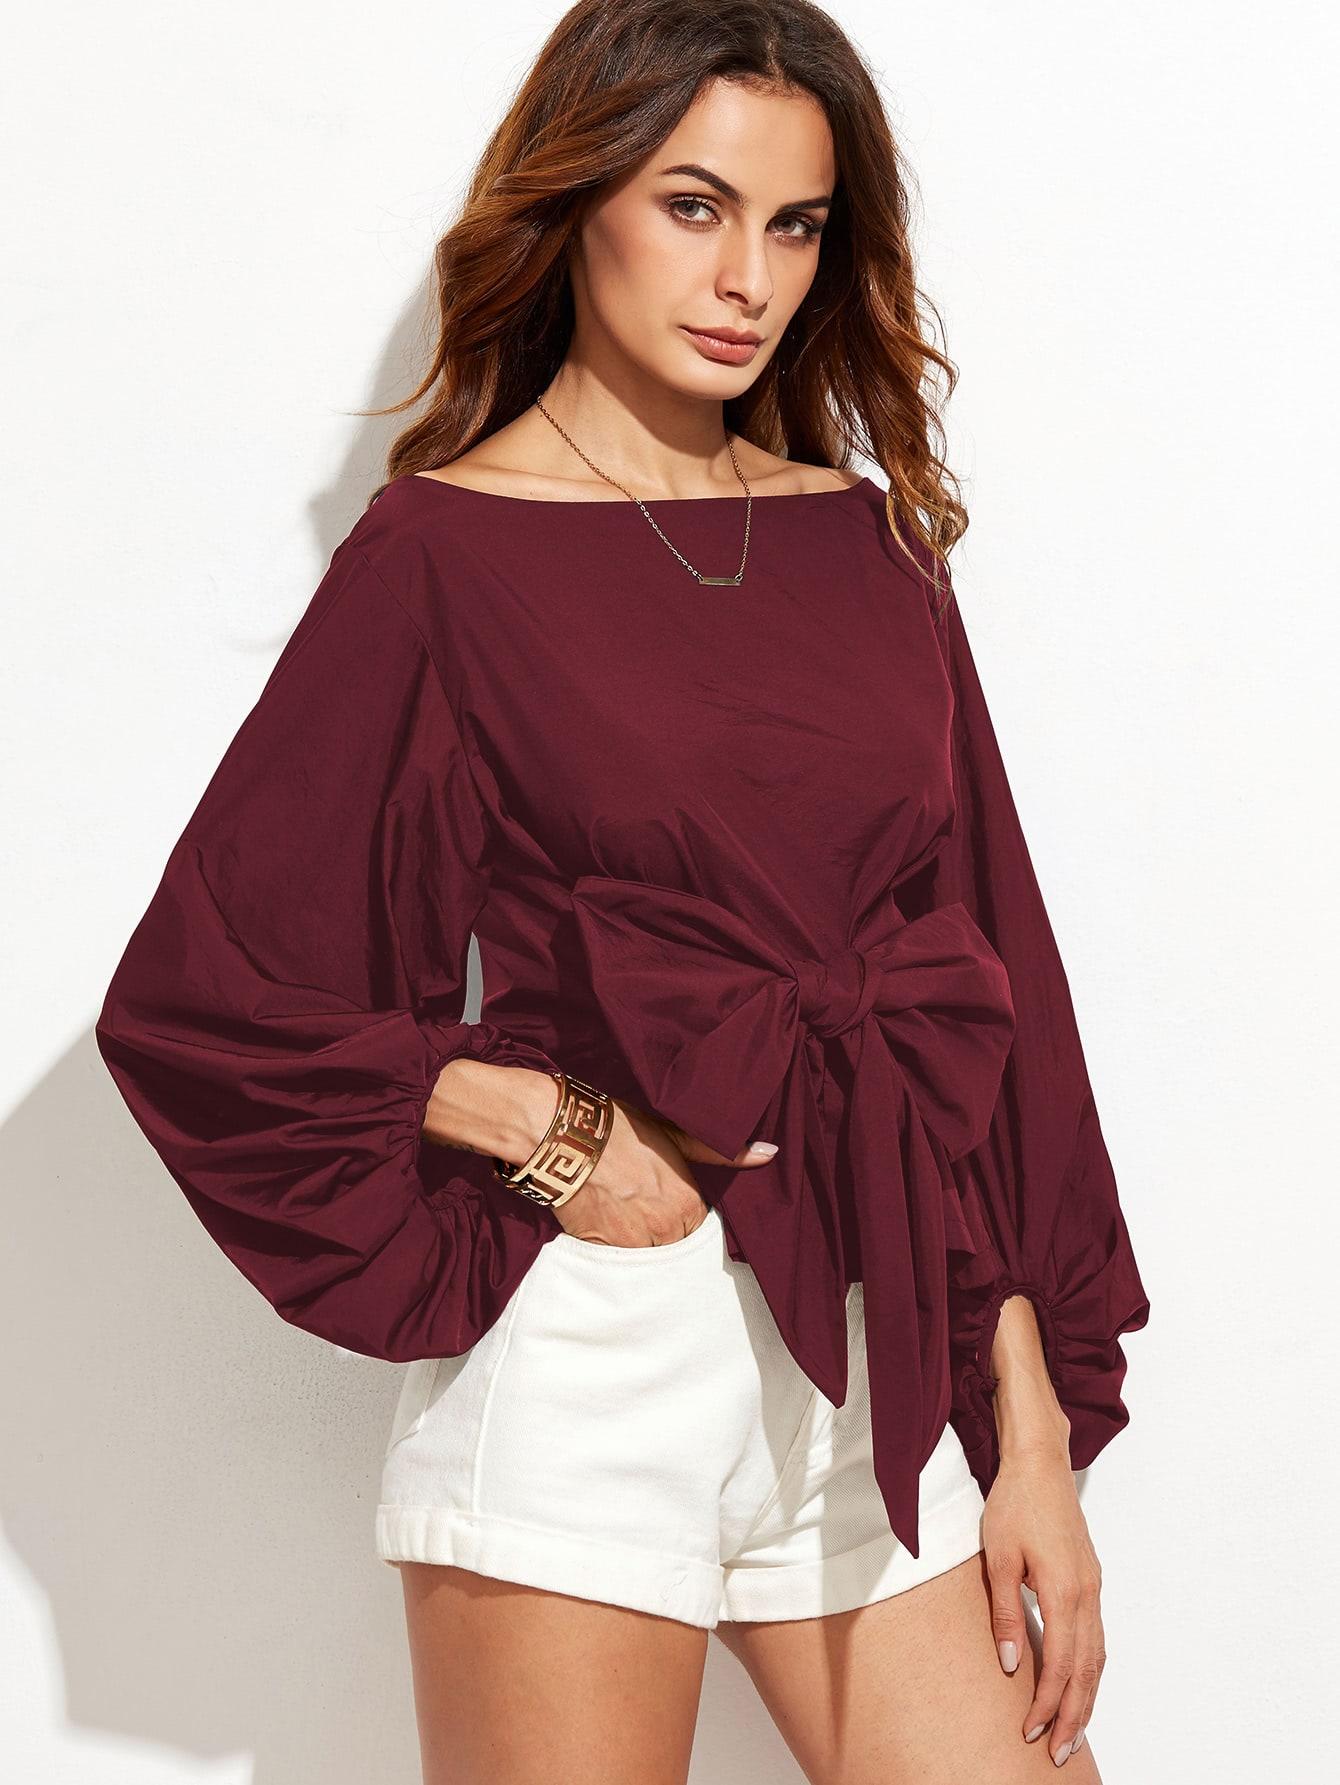 blouse161014132_2